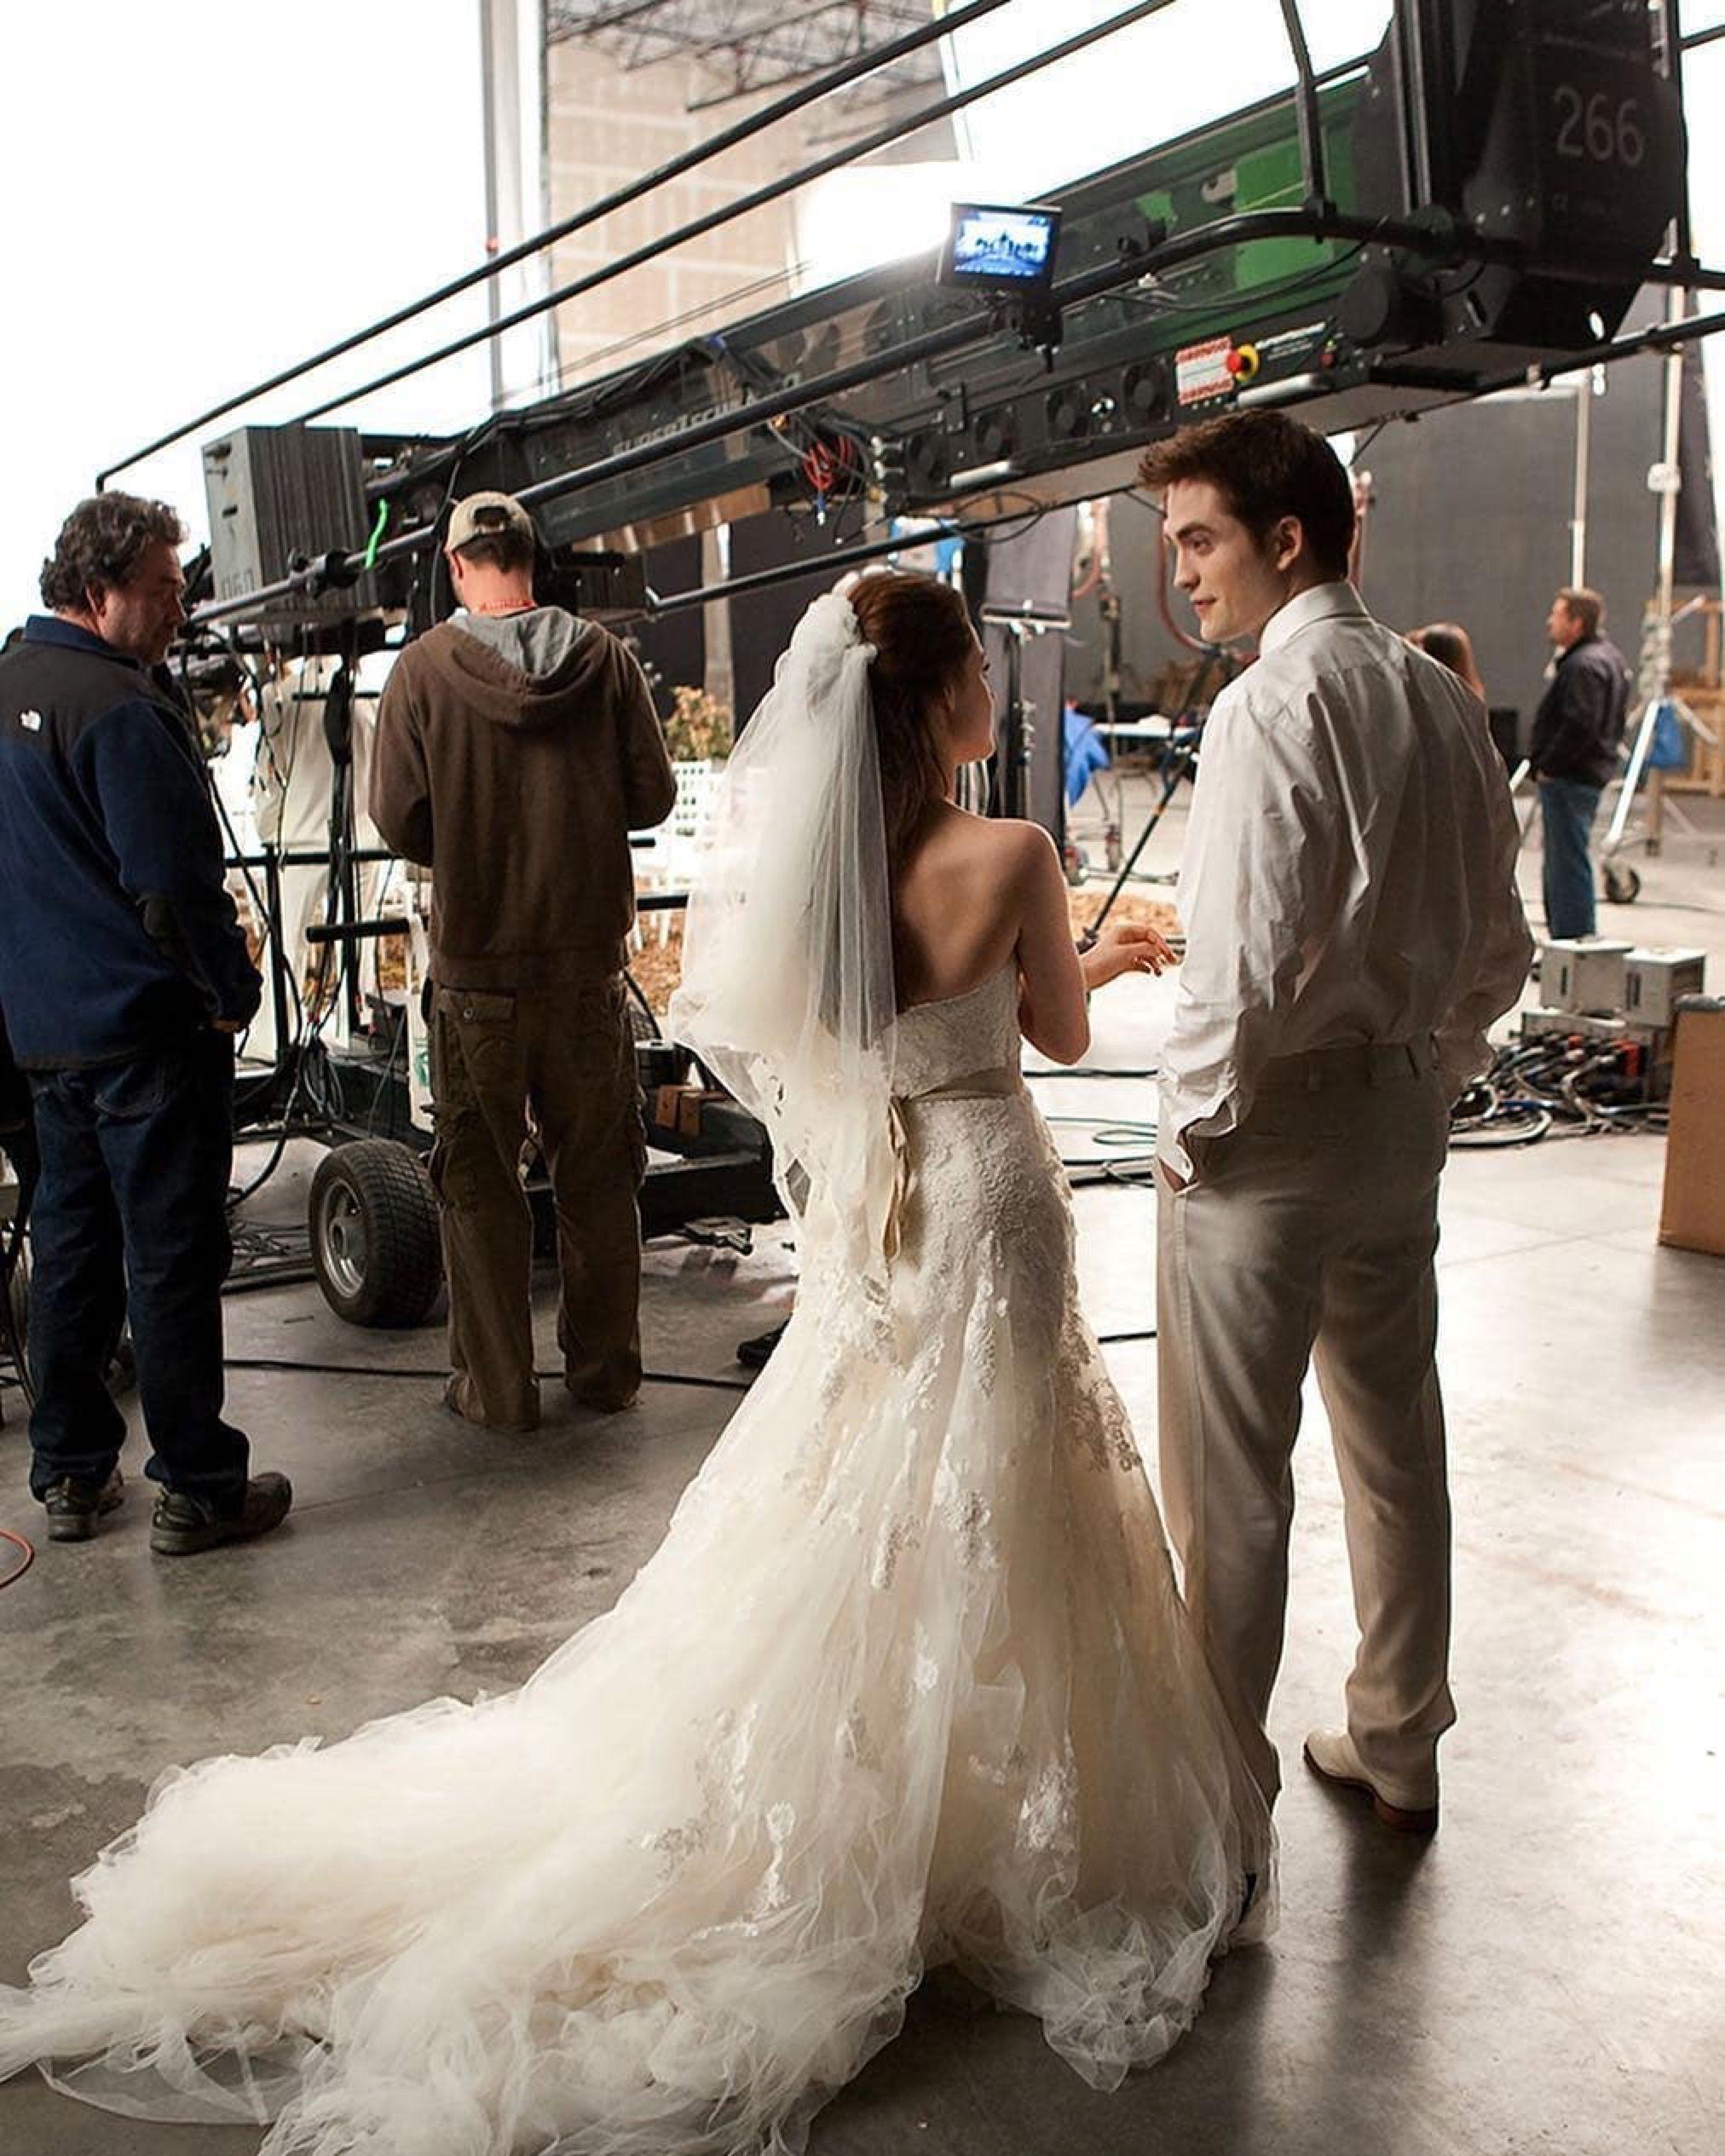 Bella's wedding dress in breaking dawn  Pin by Annabelle Whitehouse on TWILIGHT  Pinterest  Twilight saga